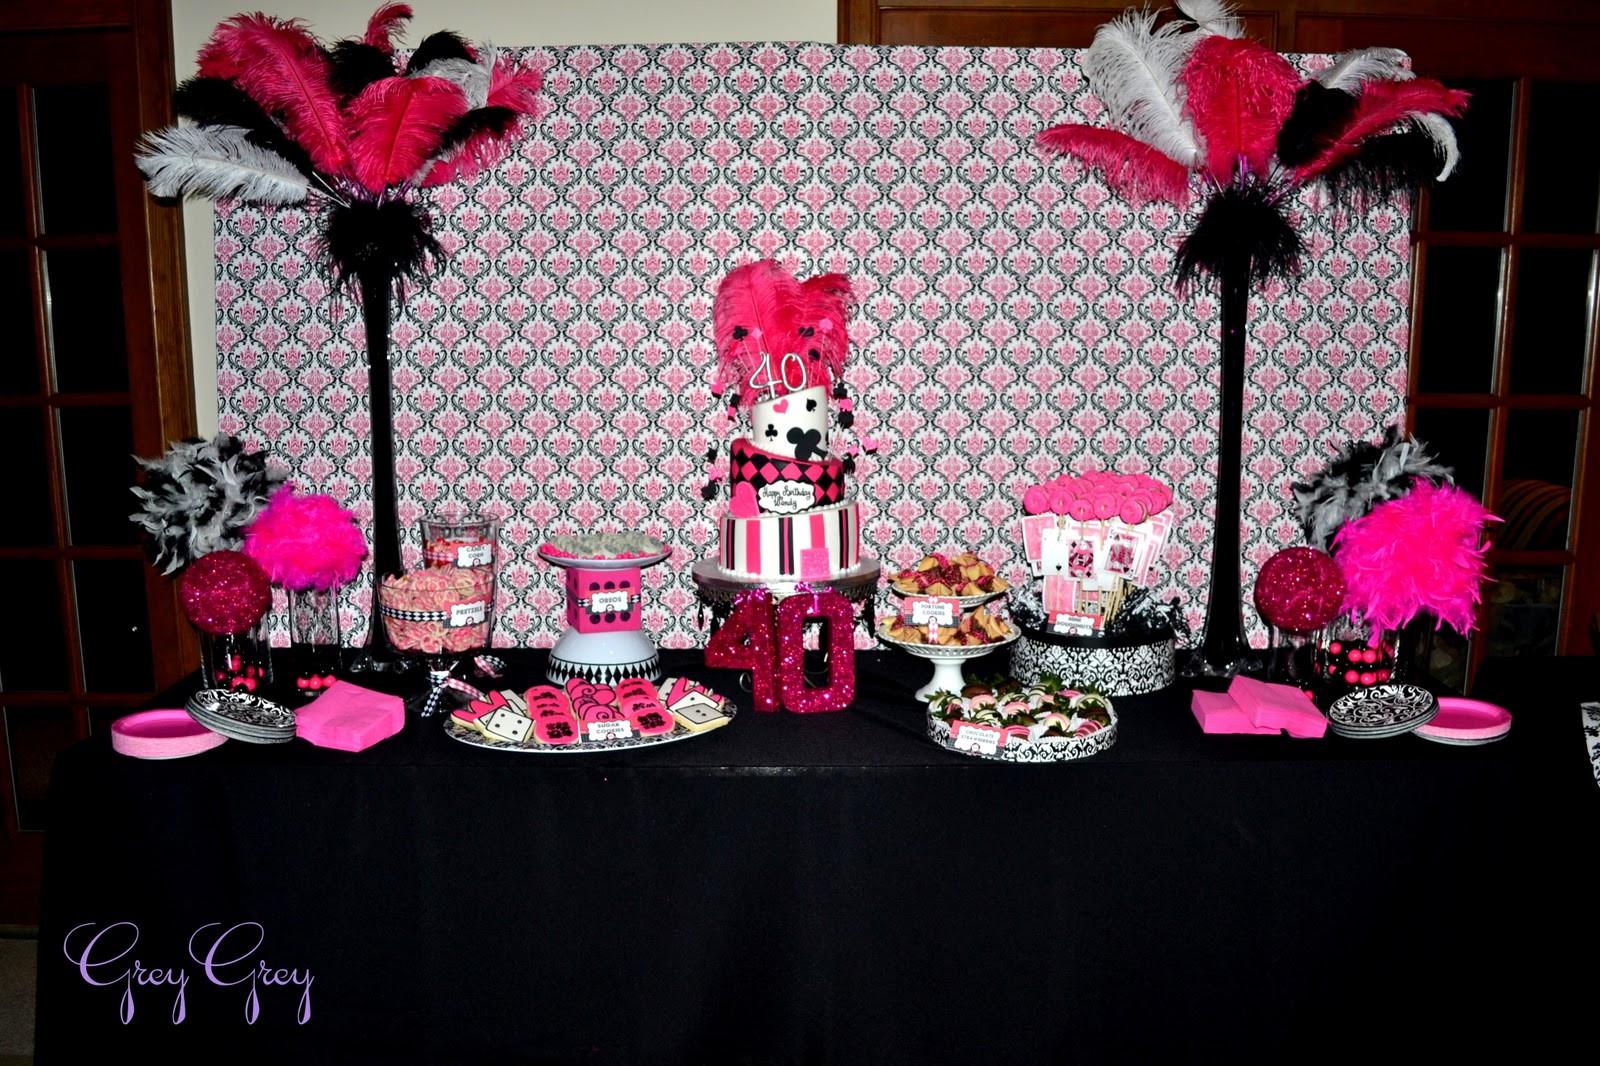 40Th Birthday Decorations Ideas  GreyGrey Designs My Parties Hot Pink Glamorous Casino